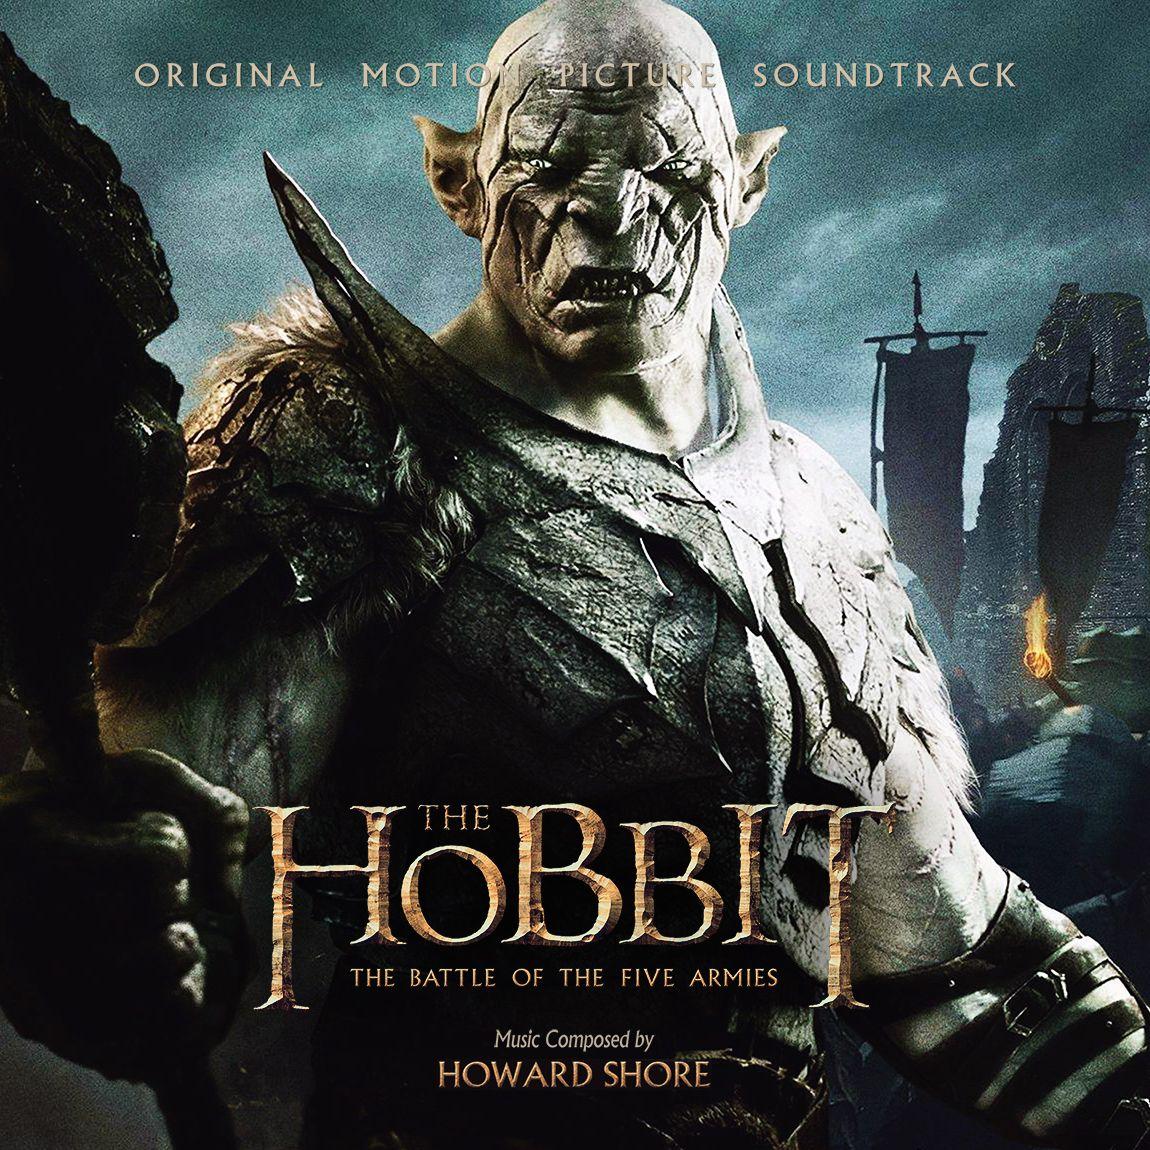 Pin By Cheyenne Kane On Thranduil The Elvenking Hobbit Trilogy Musical Poster The Hobbit Harry Potter Musical